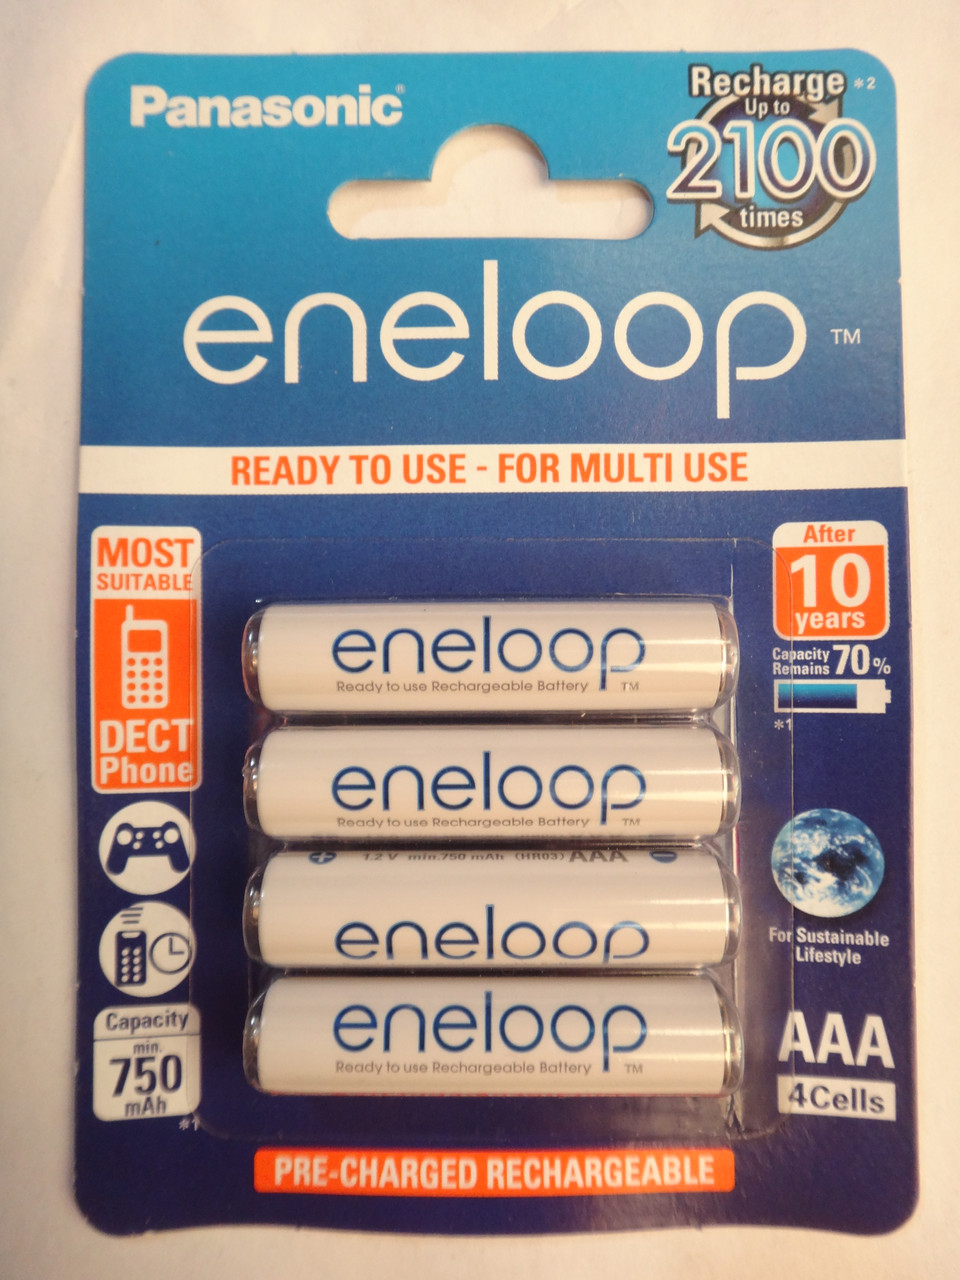 Аккумулятор AAA Panasonic eneloop HR03 1,2V 750mAh (up to 2100) упаковка - 4шт pre-charged rechargeable